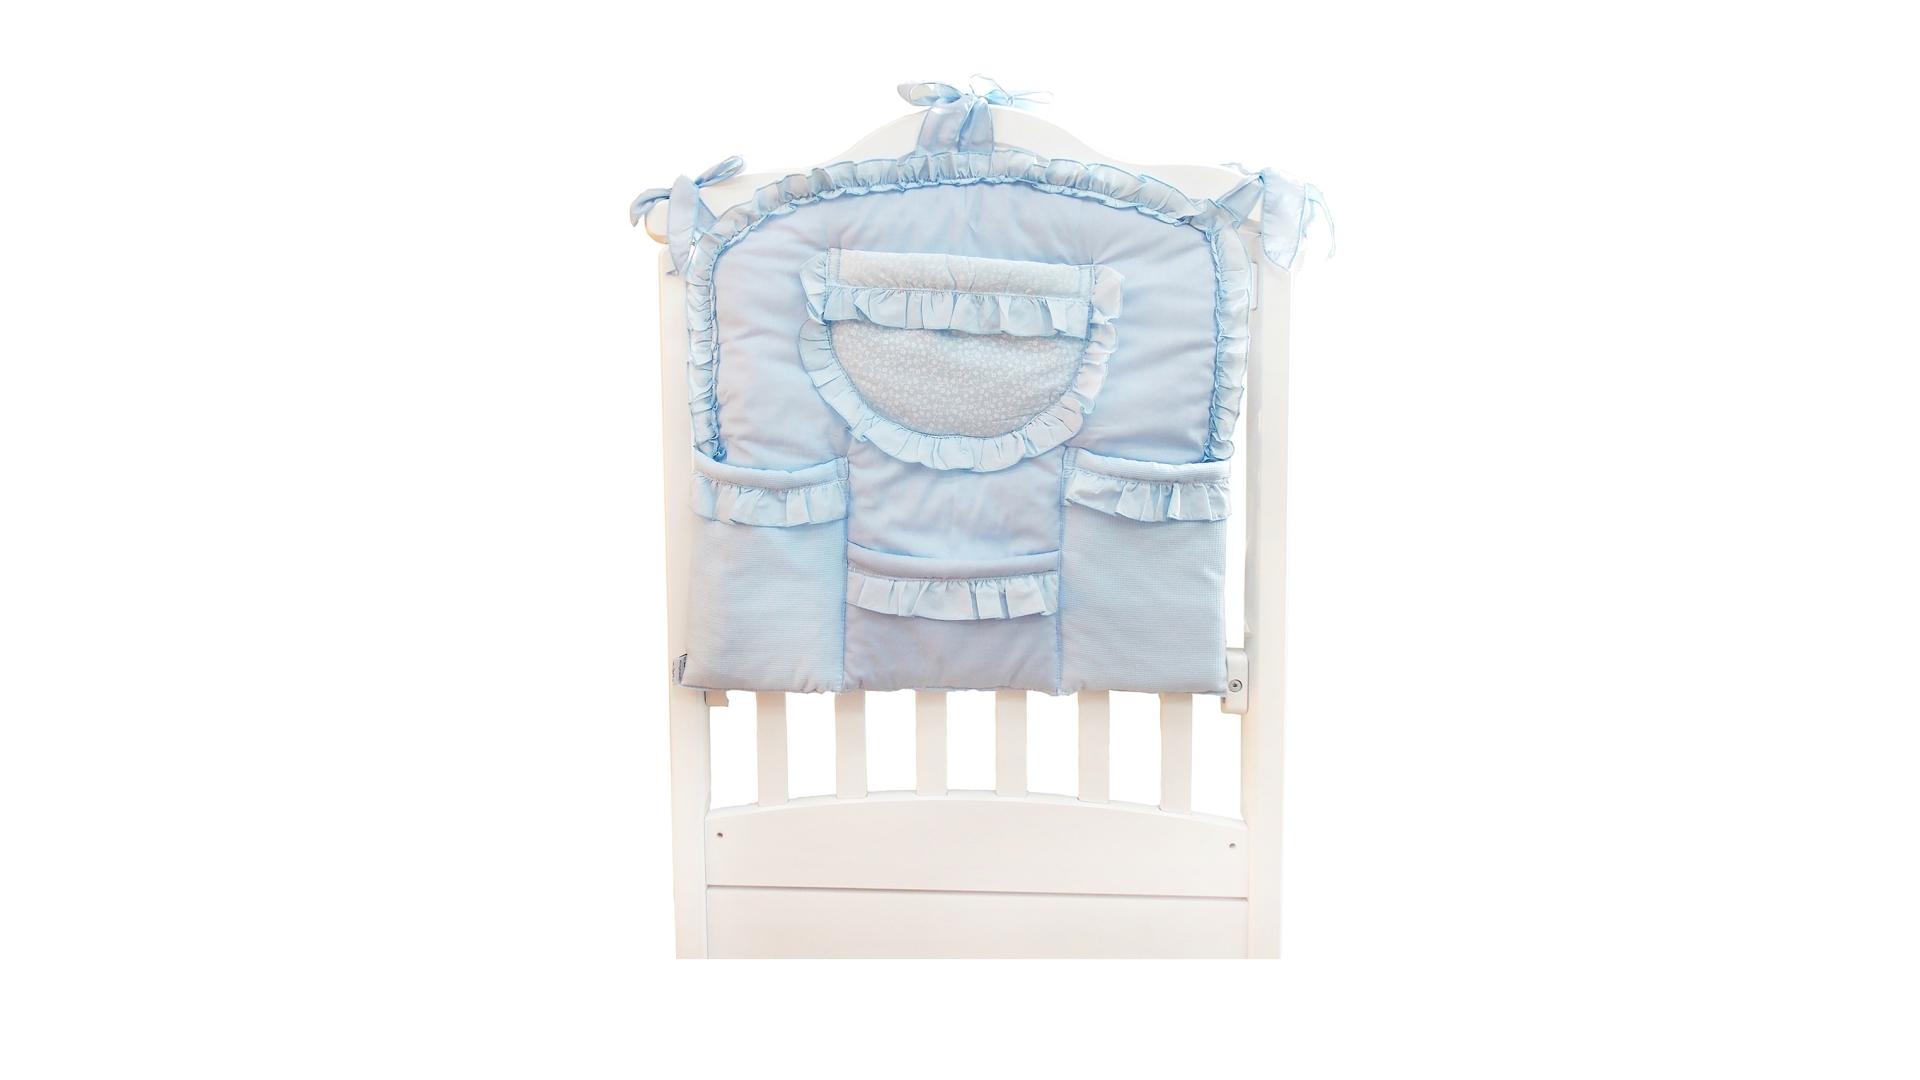 Аксессуар в кроватку Карман Светик (голубой) фото FullHD (0)